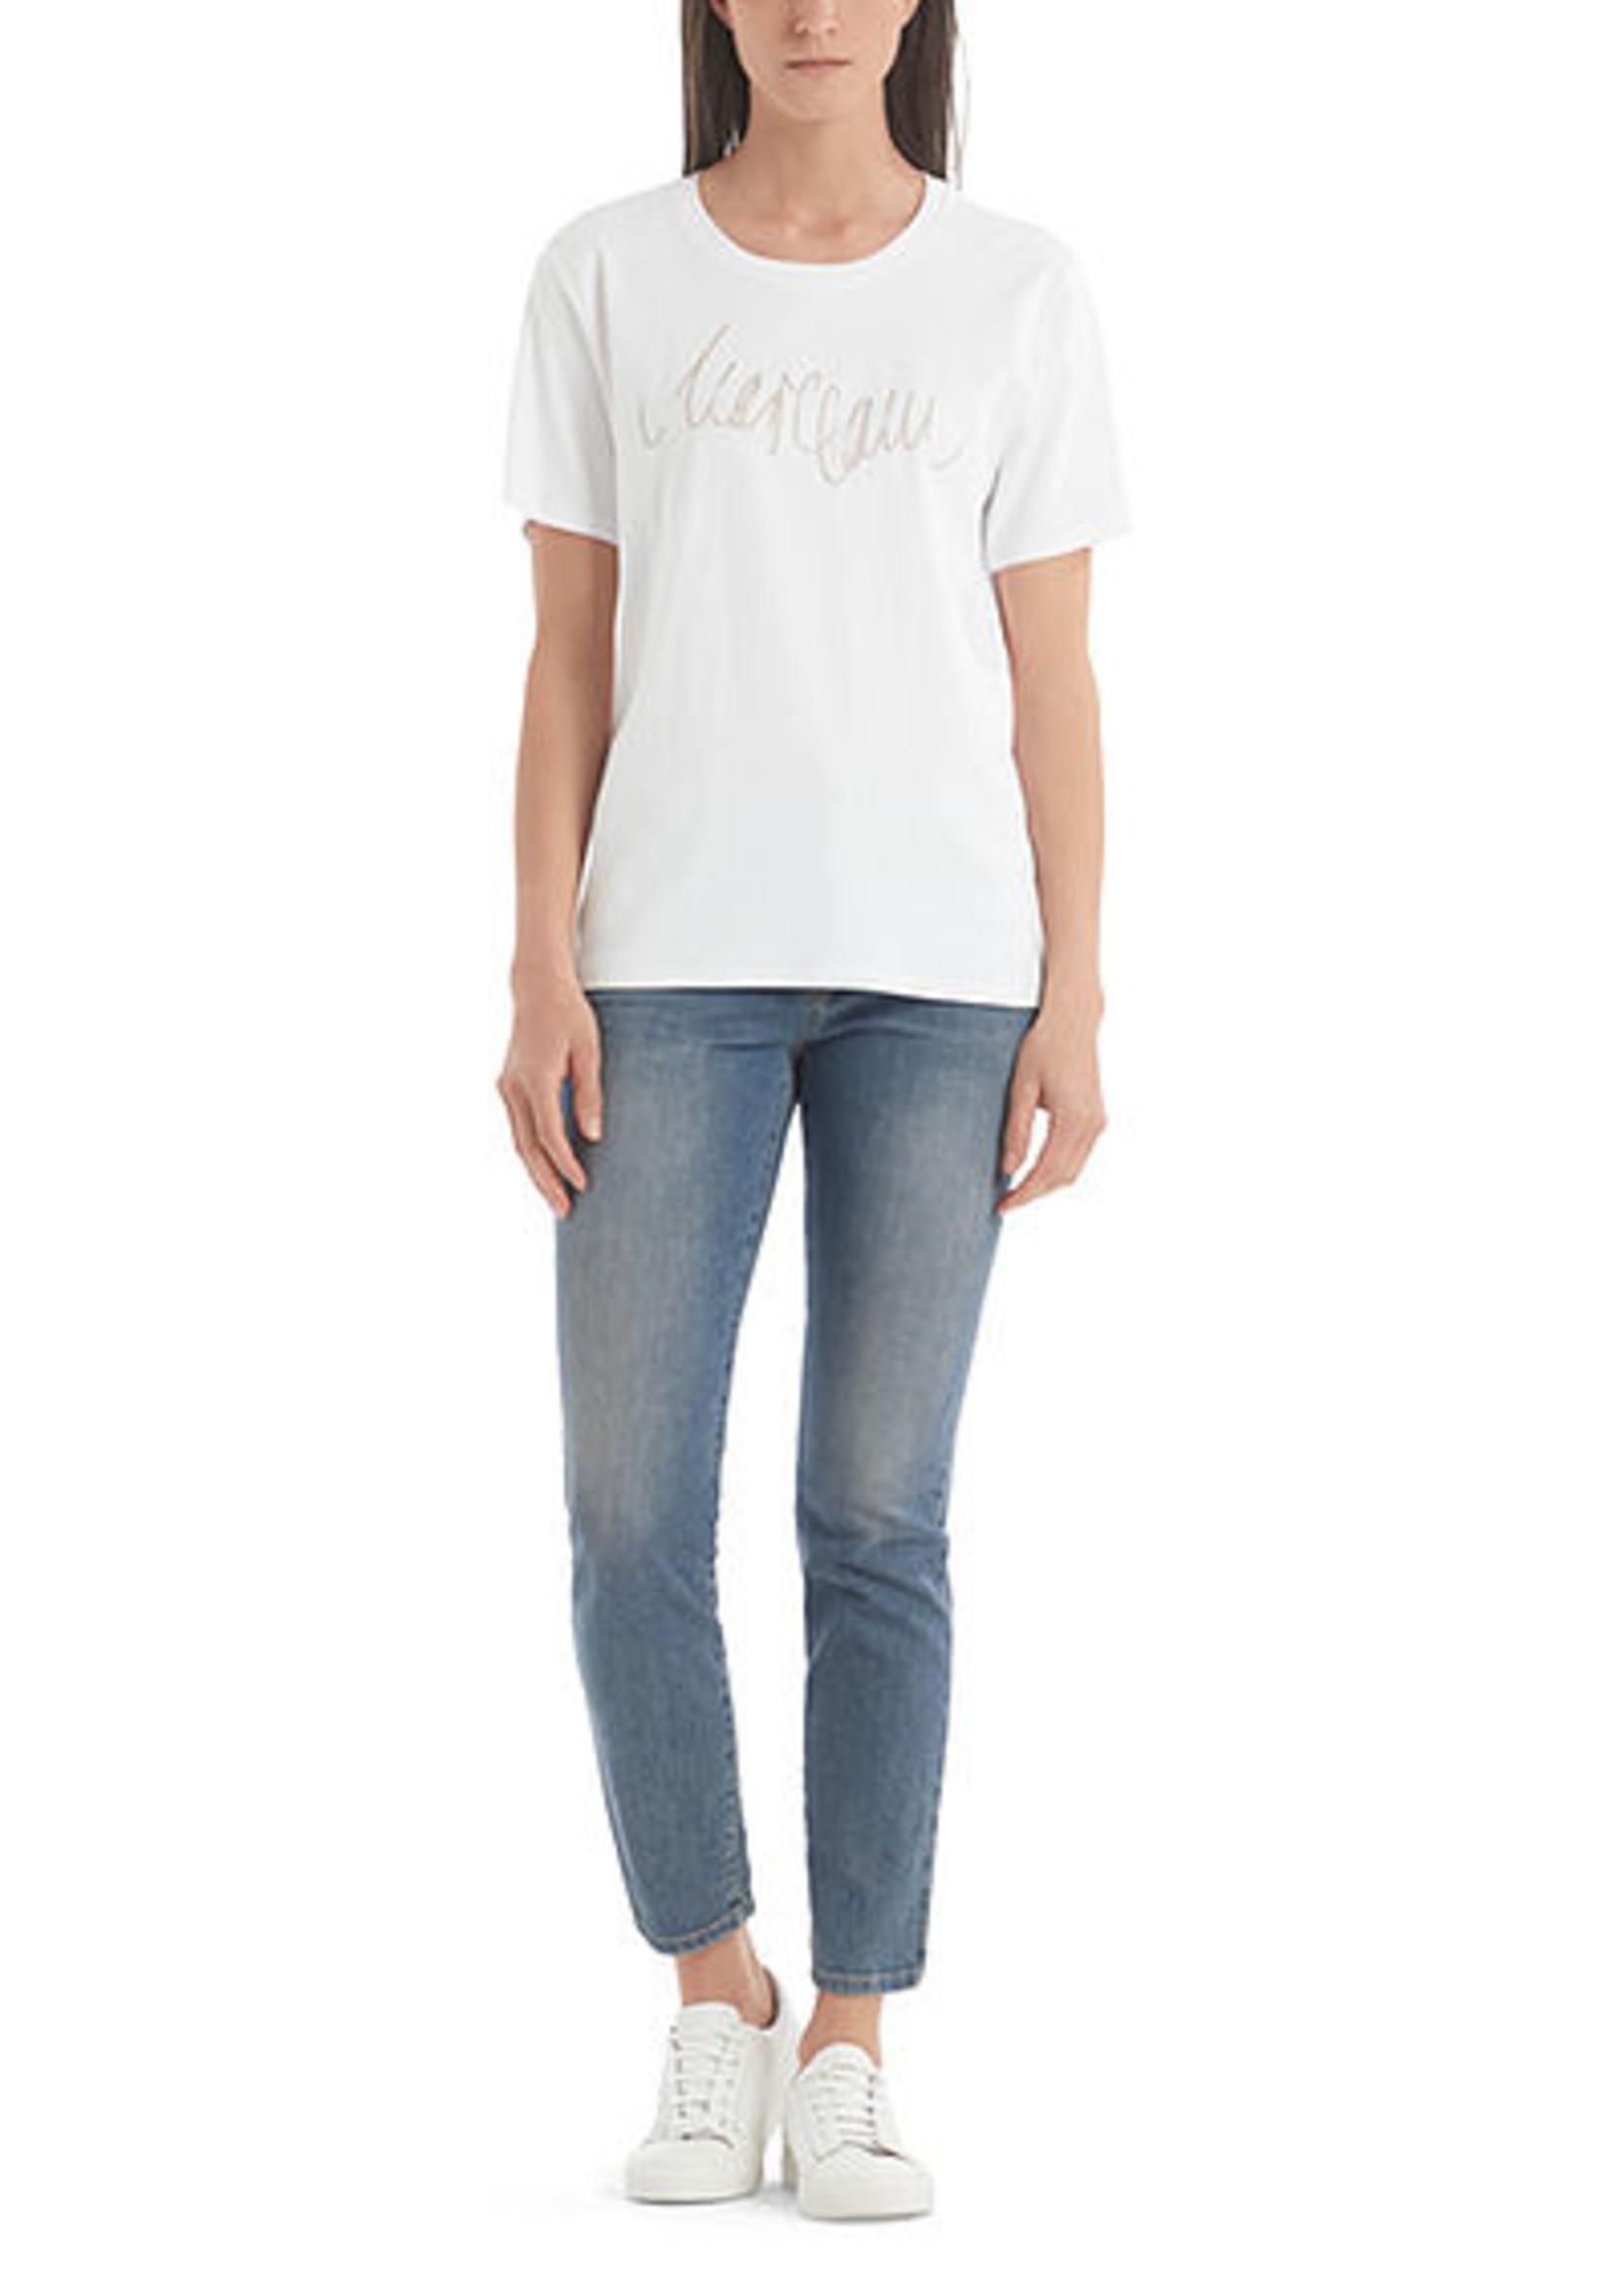 T-shirt RC 48.20 J90 white